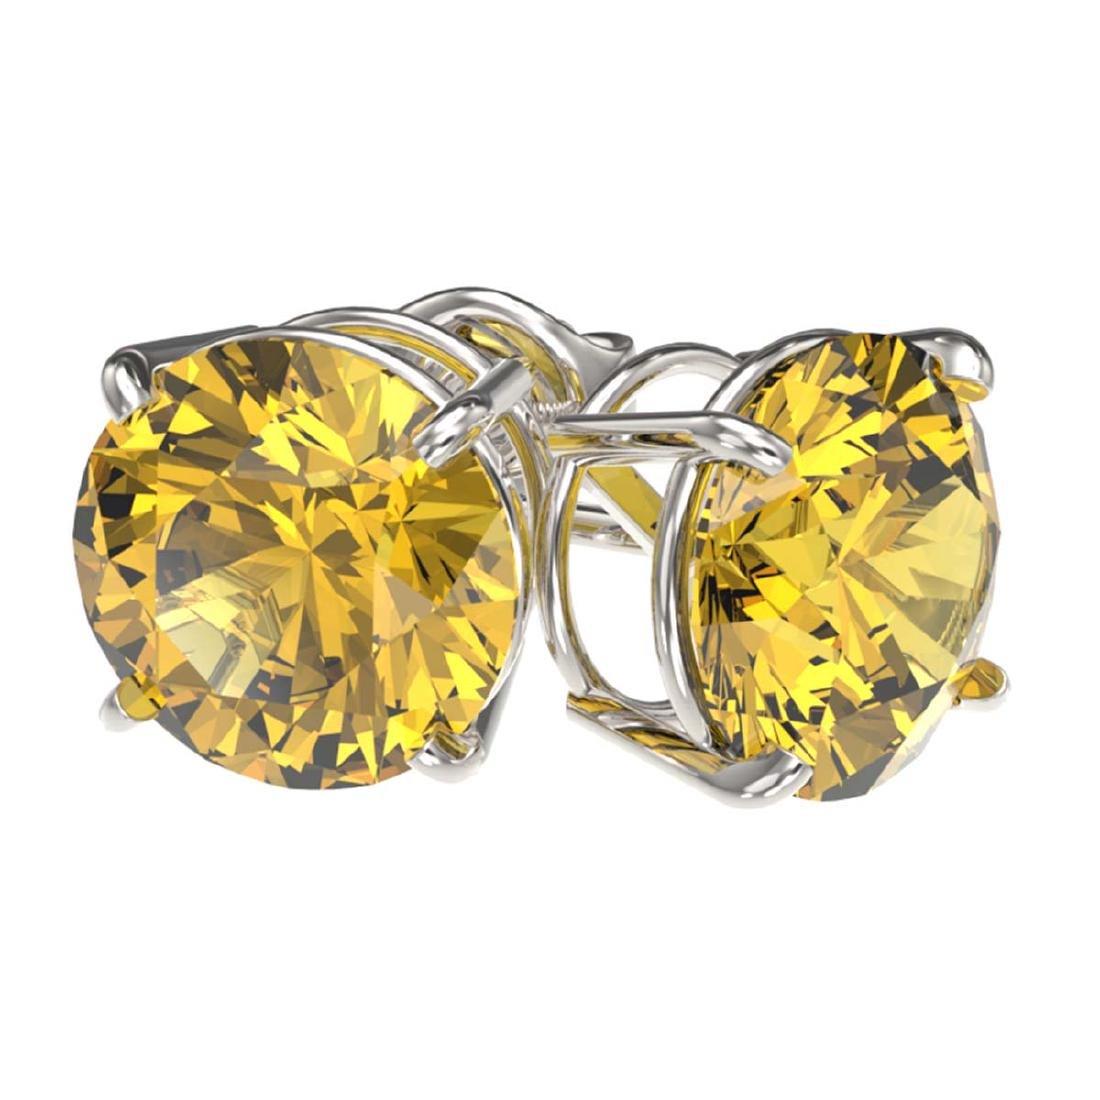 3 ctw Intense Yellow Diamond Stud Earrings 10K White - 3